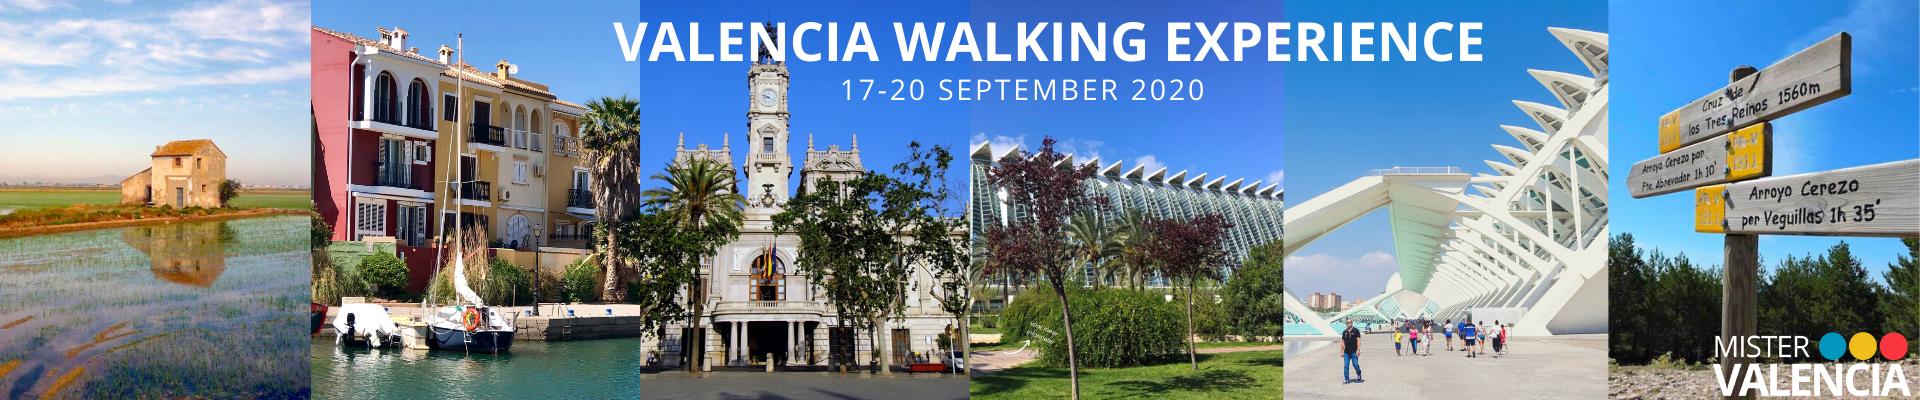 Valencia Walking Experience Sept 2020